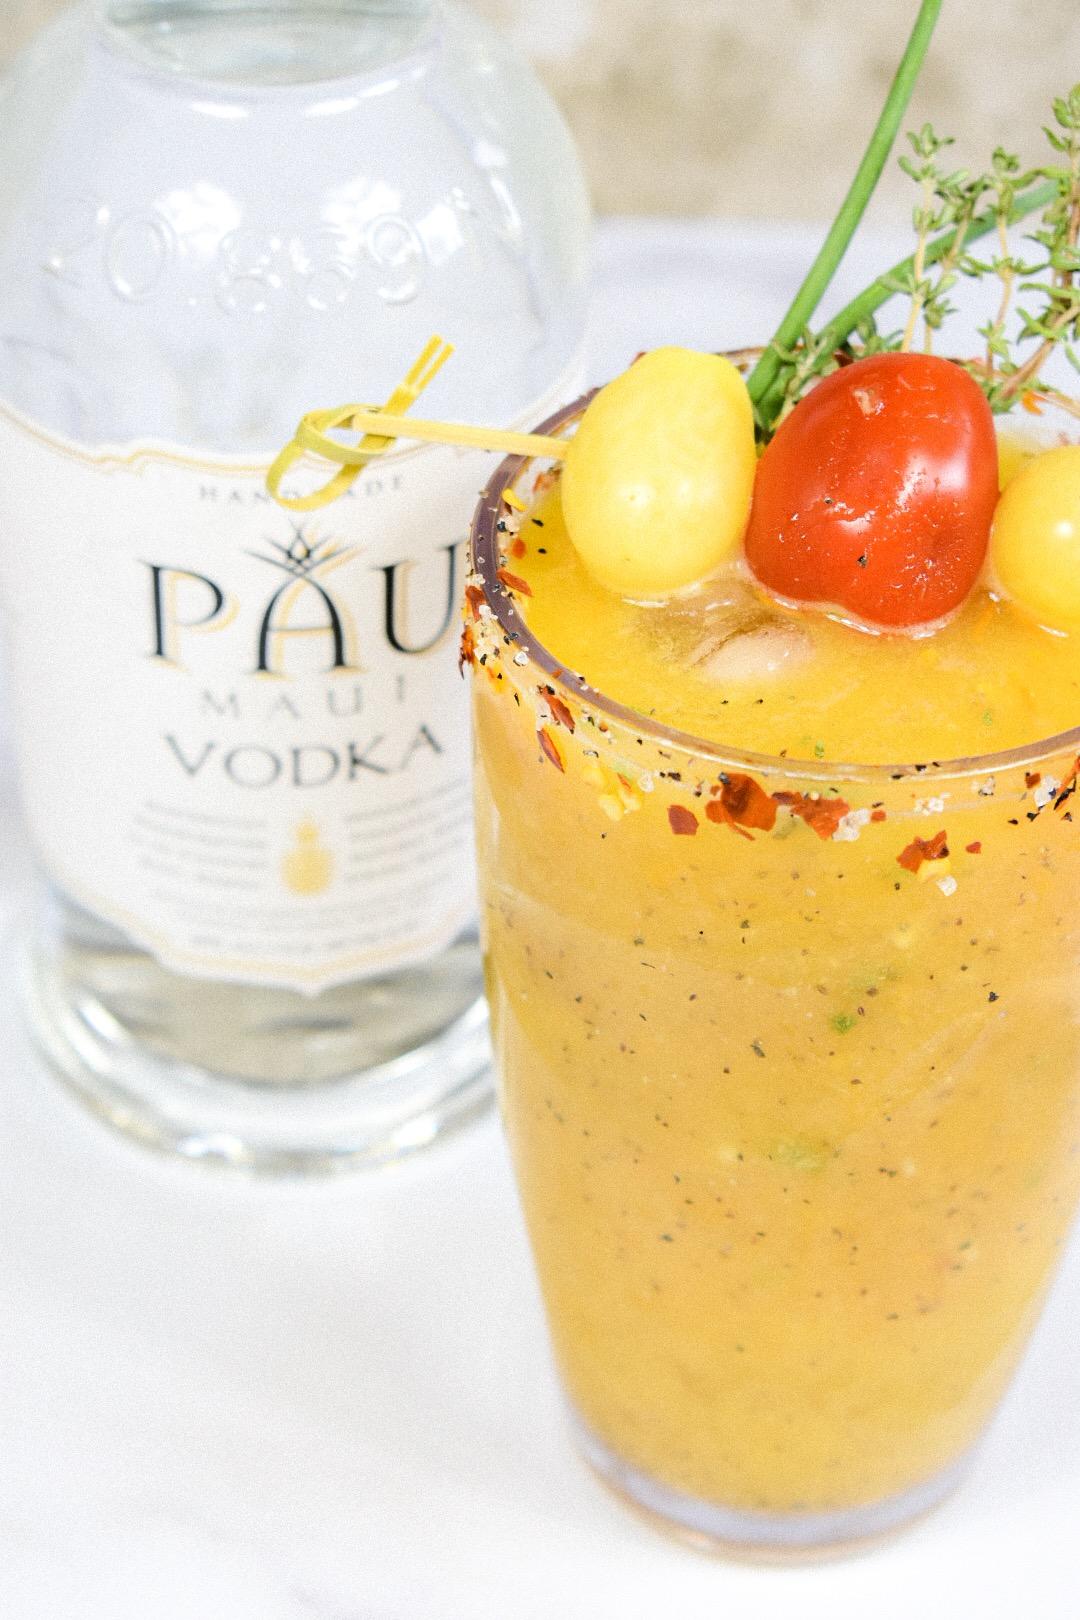 pau maui vodka fresh heirloom tomato bloody mary recipe bloody mary obsessed.jpg 4.jpg